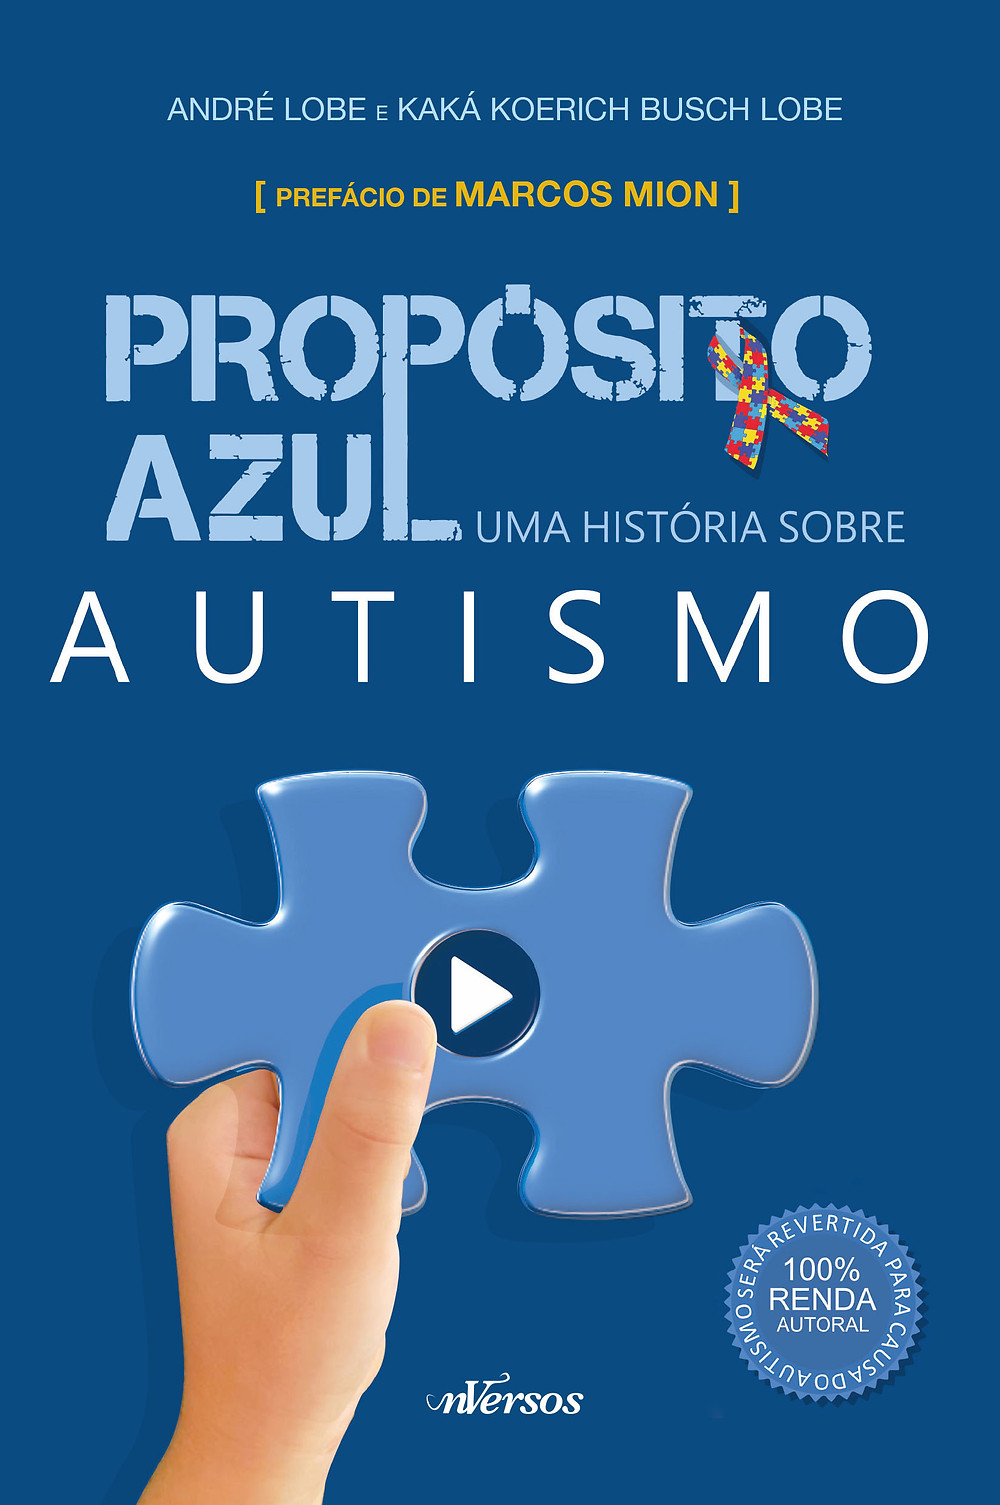 Livro sobre autismo - Propósito Azul